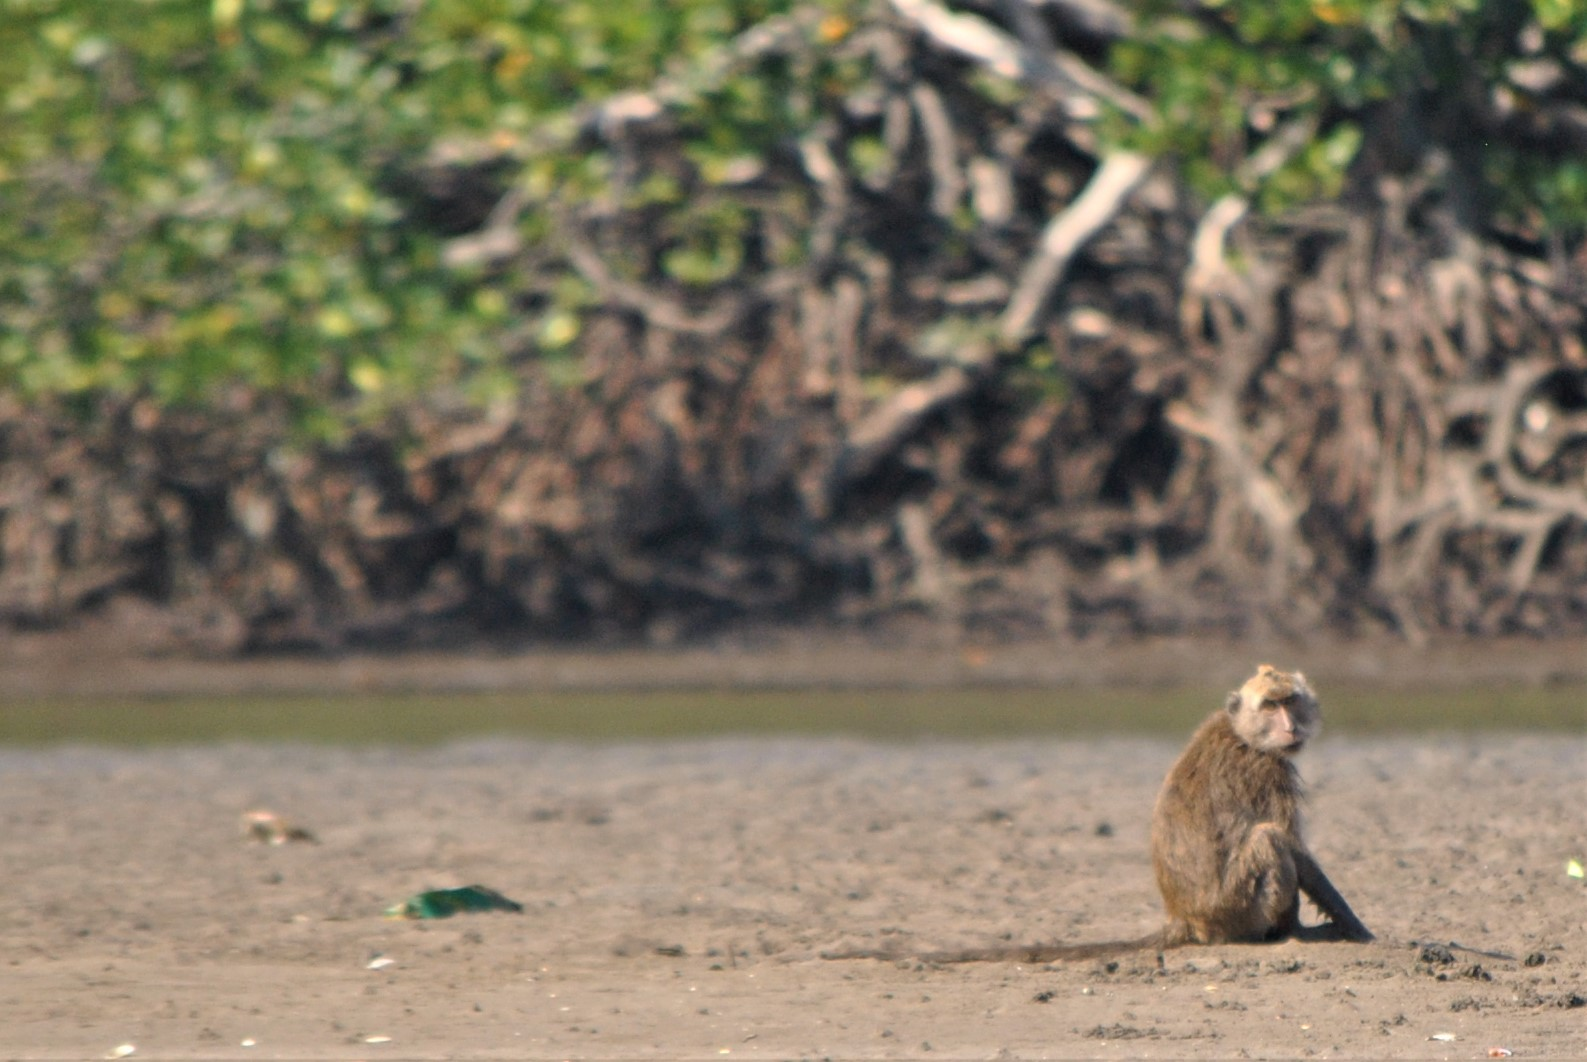 One little monkey sitting on a beach...